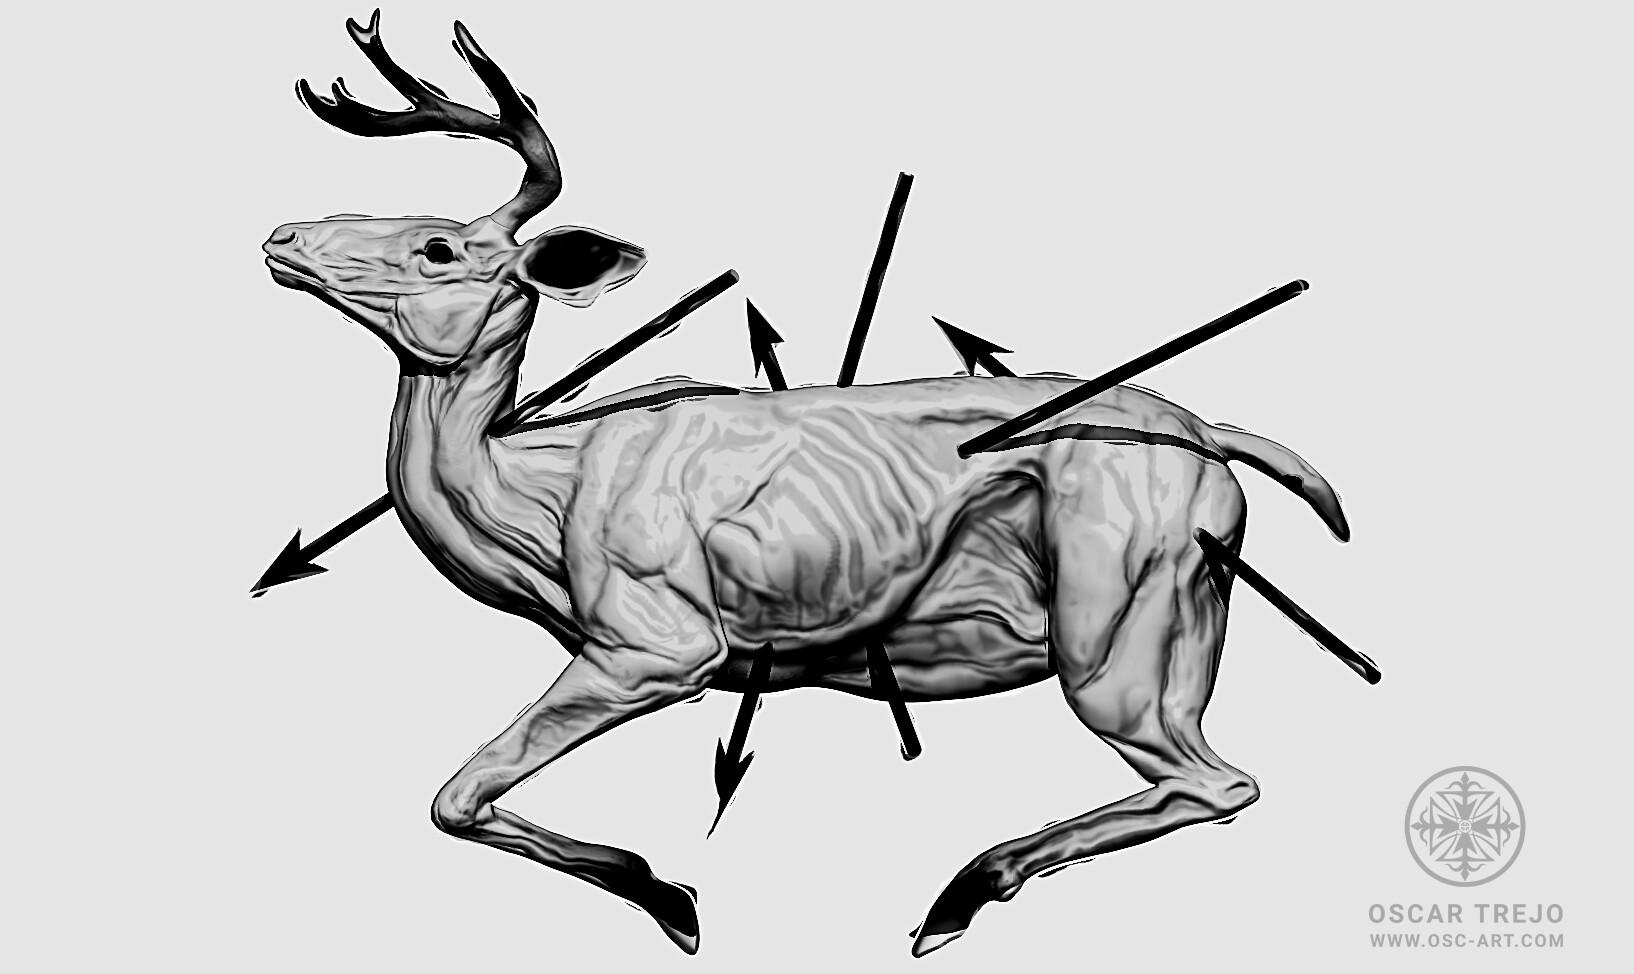 Oscar trejo deer oscartrejo1